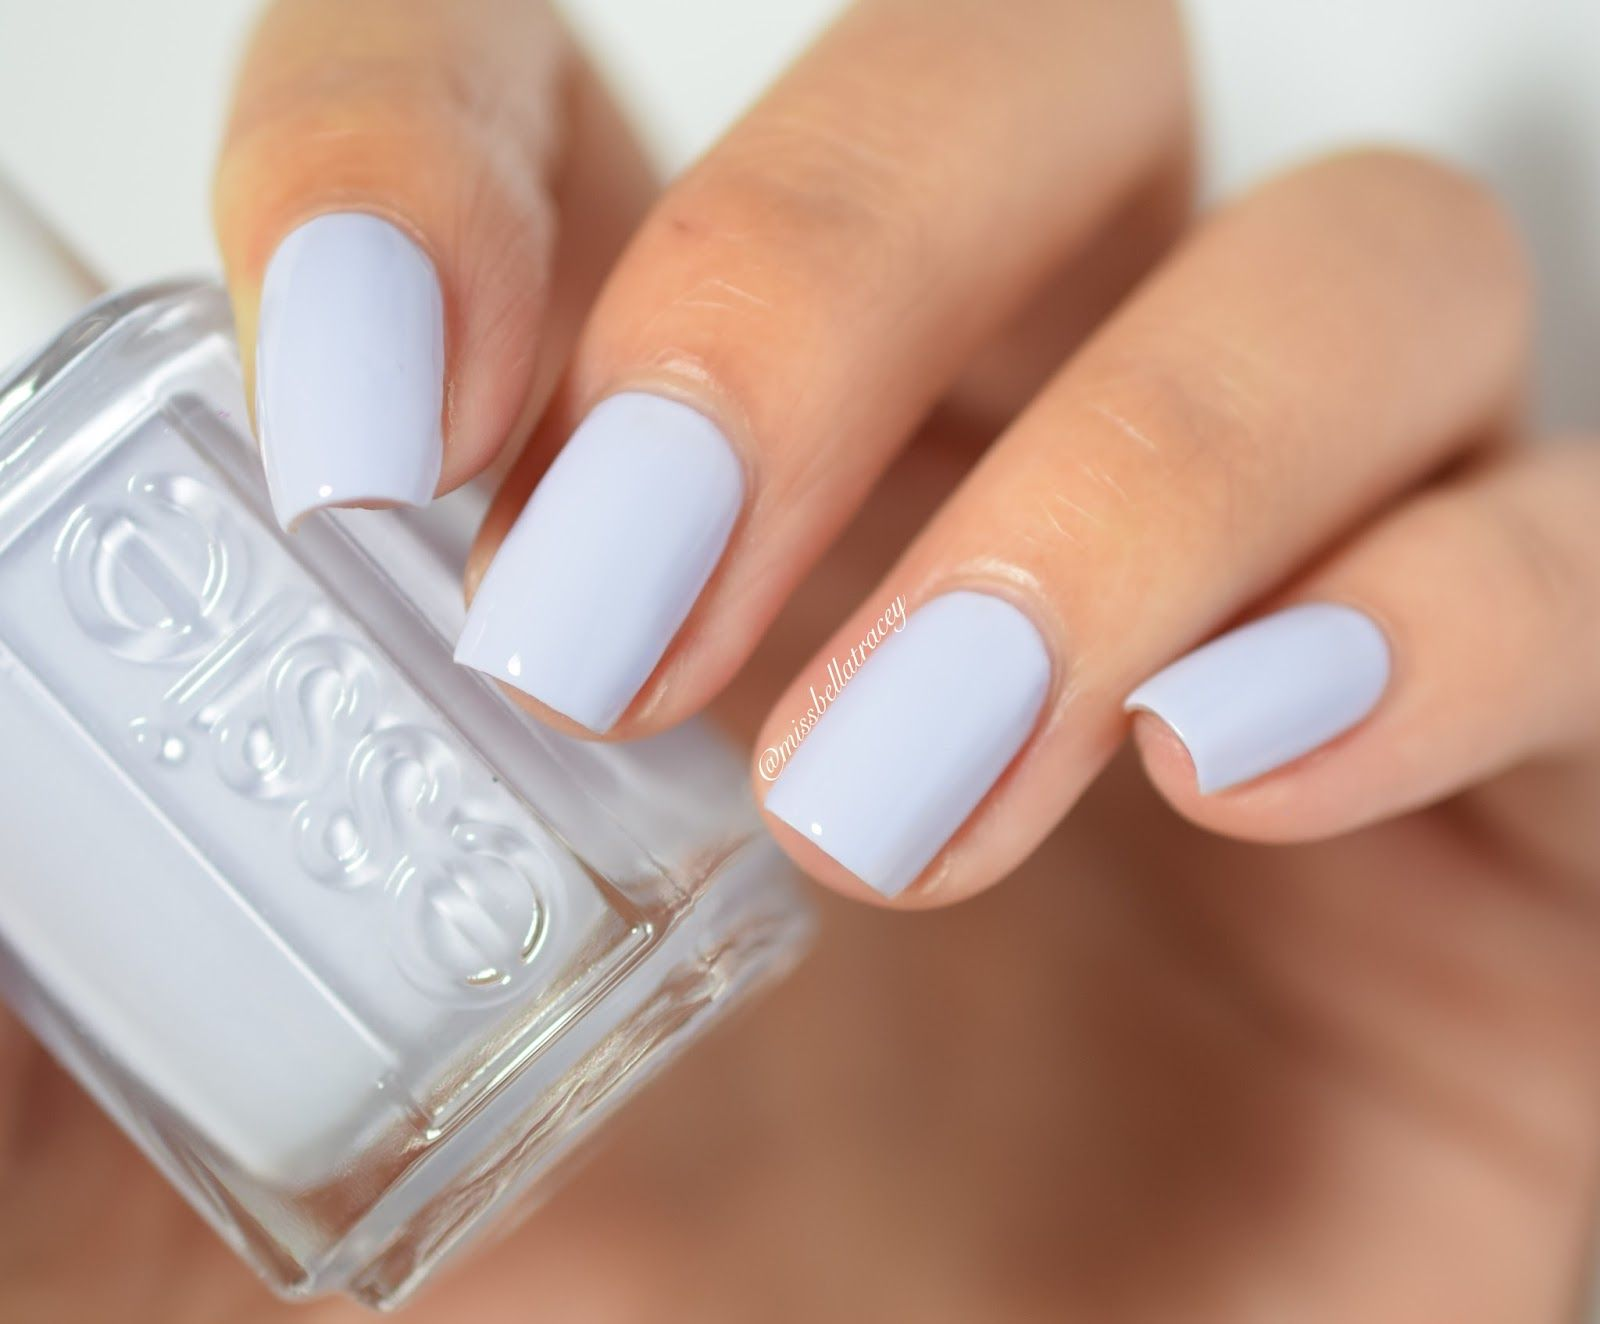 Essie Virgin Snow | Nailspiration | Pinterest | Essie nail polish